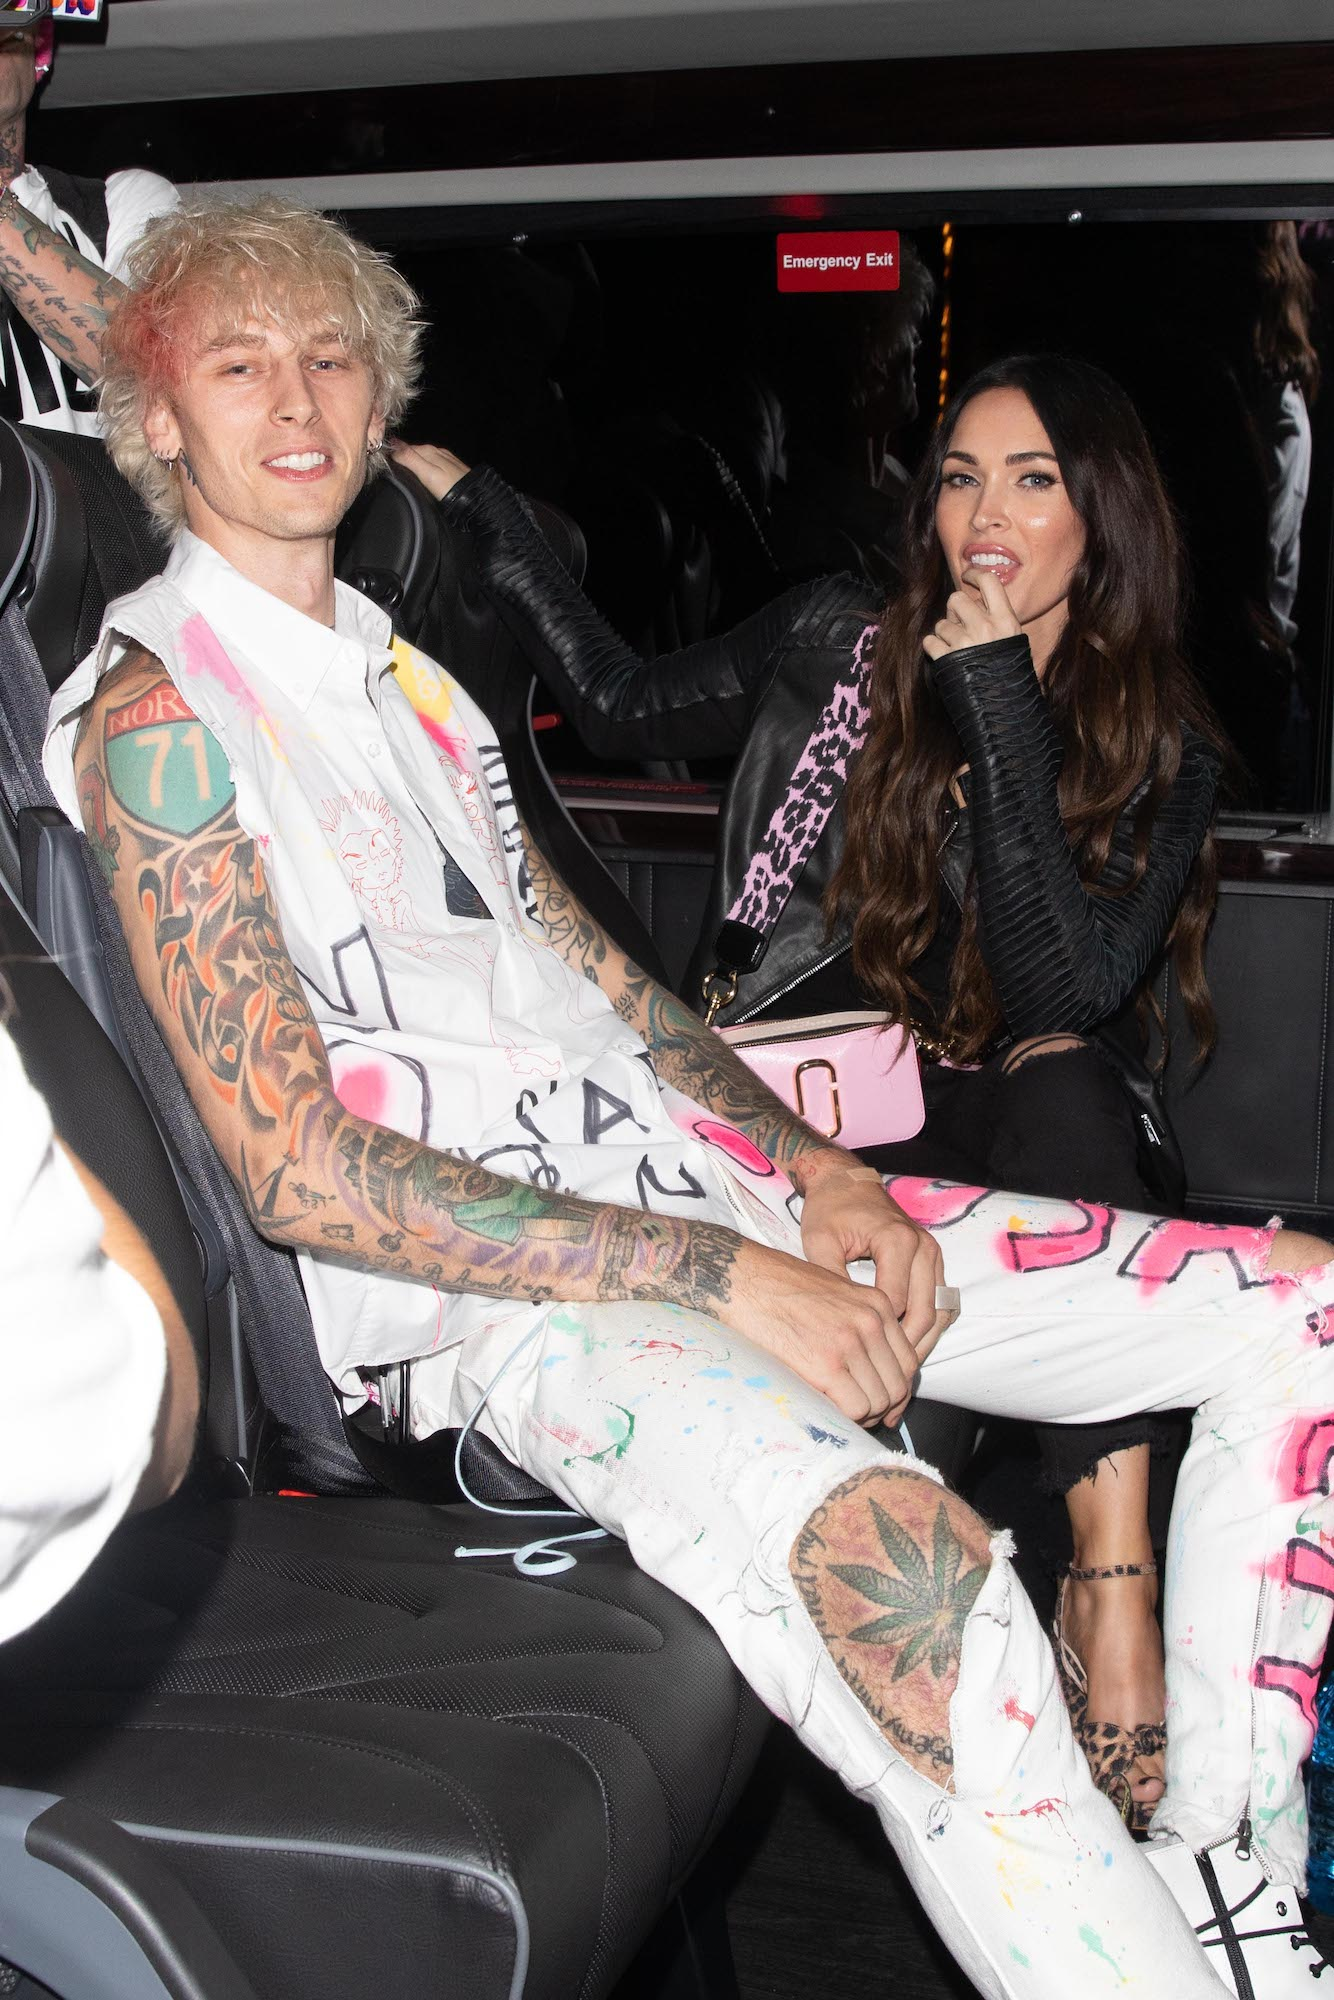 Machine Gun Kelly and Megan Fox leaving a restaurant on September 24, 2020 in Los Angeles, California.